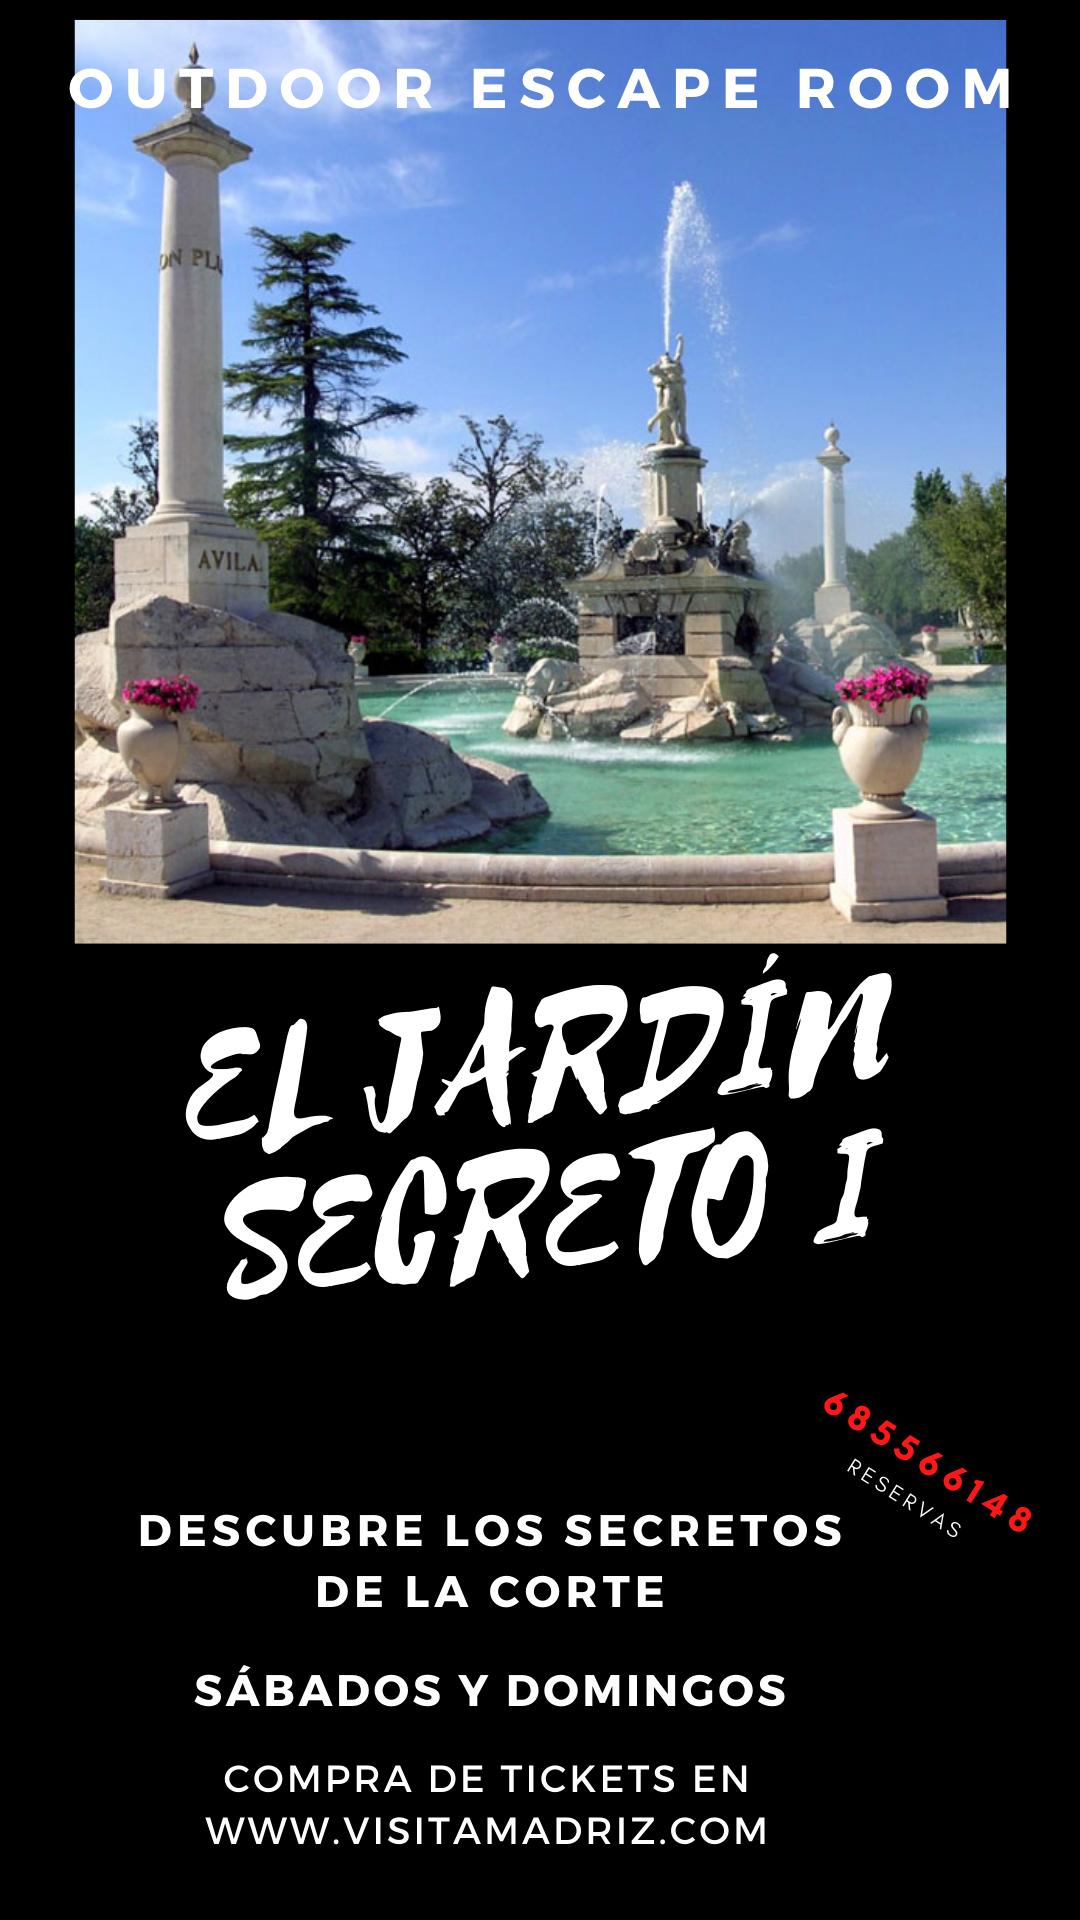 EL JARDÍN SECRETO I